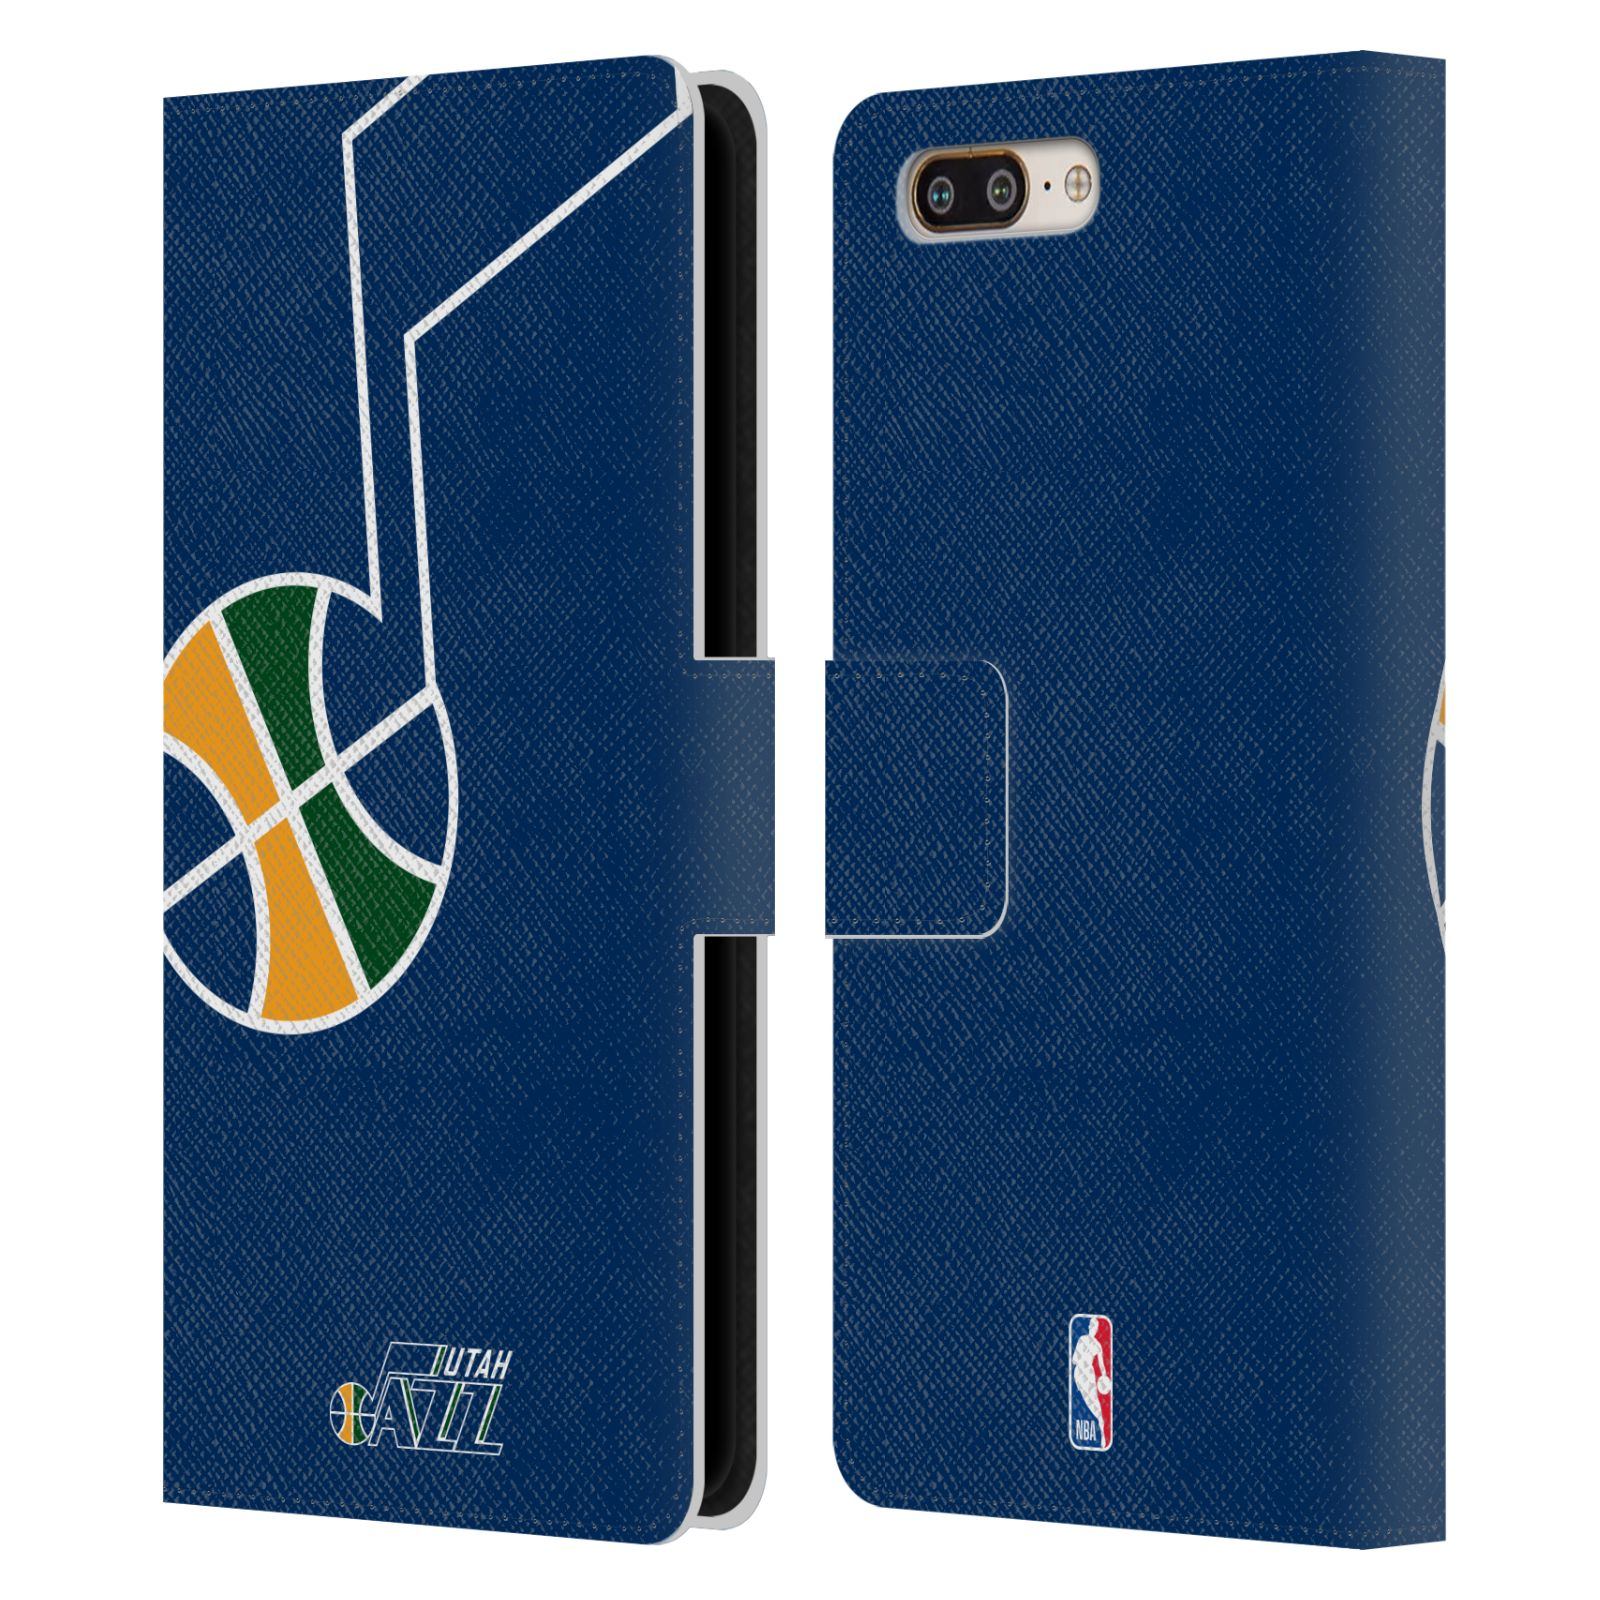 UFFICIALE-NBA-UTAH-JAZZ-COVER-A-PORTAFOGLIO-IN-PELLE-PER-BLACKBERRY-ONEPLUS